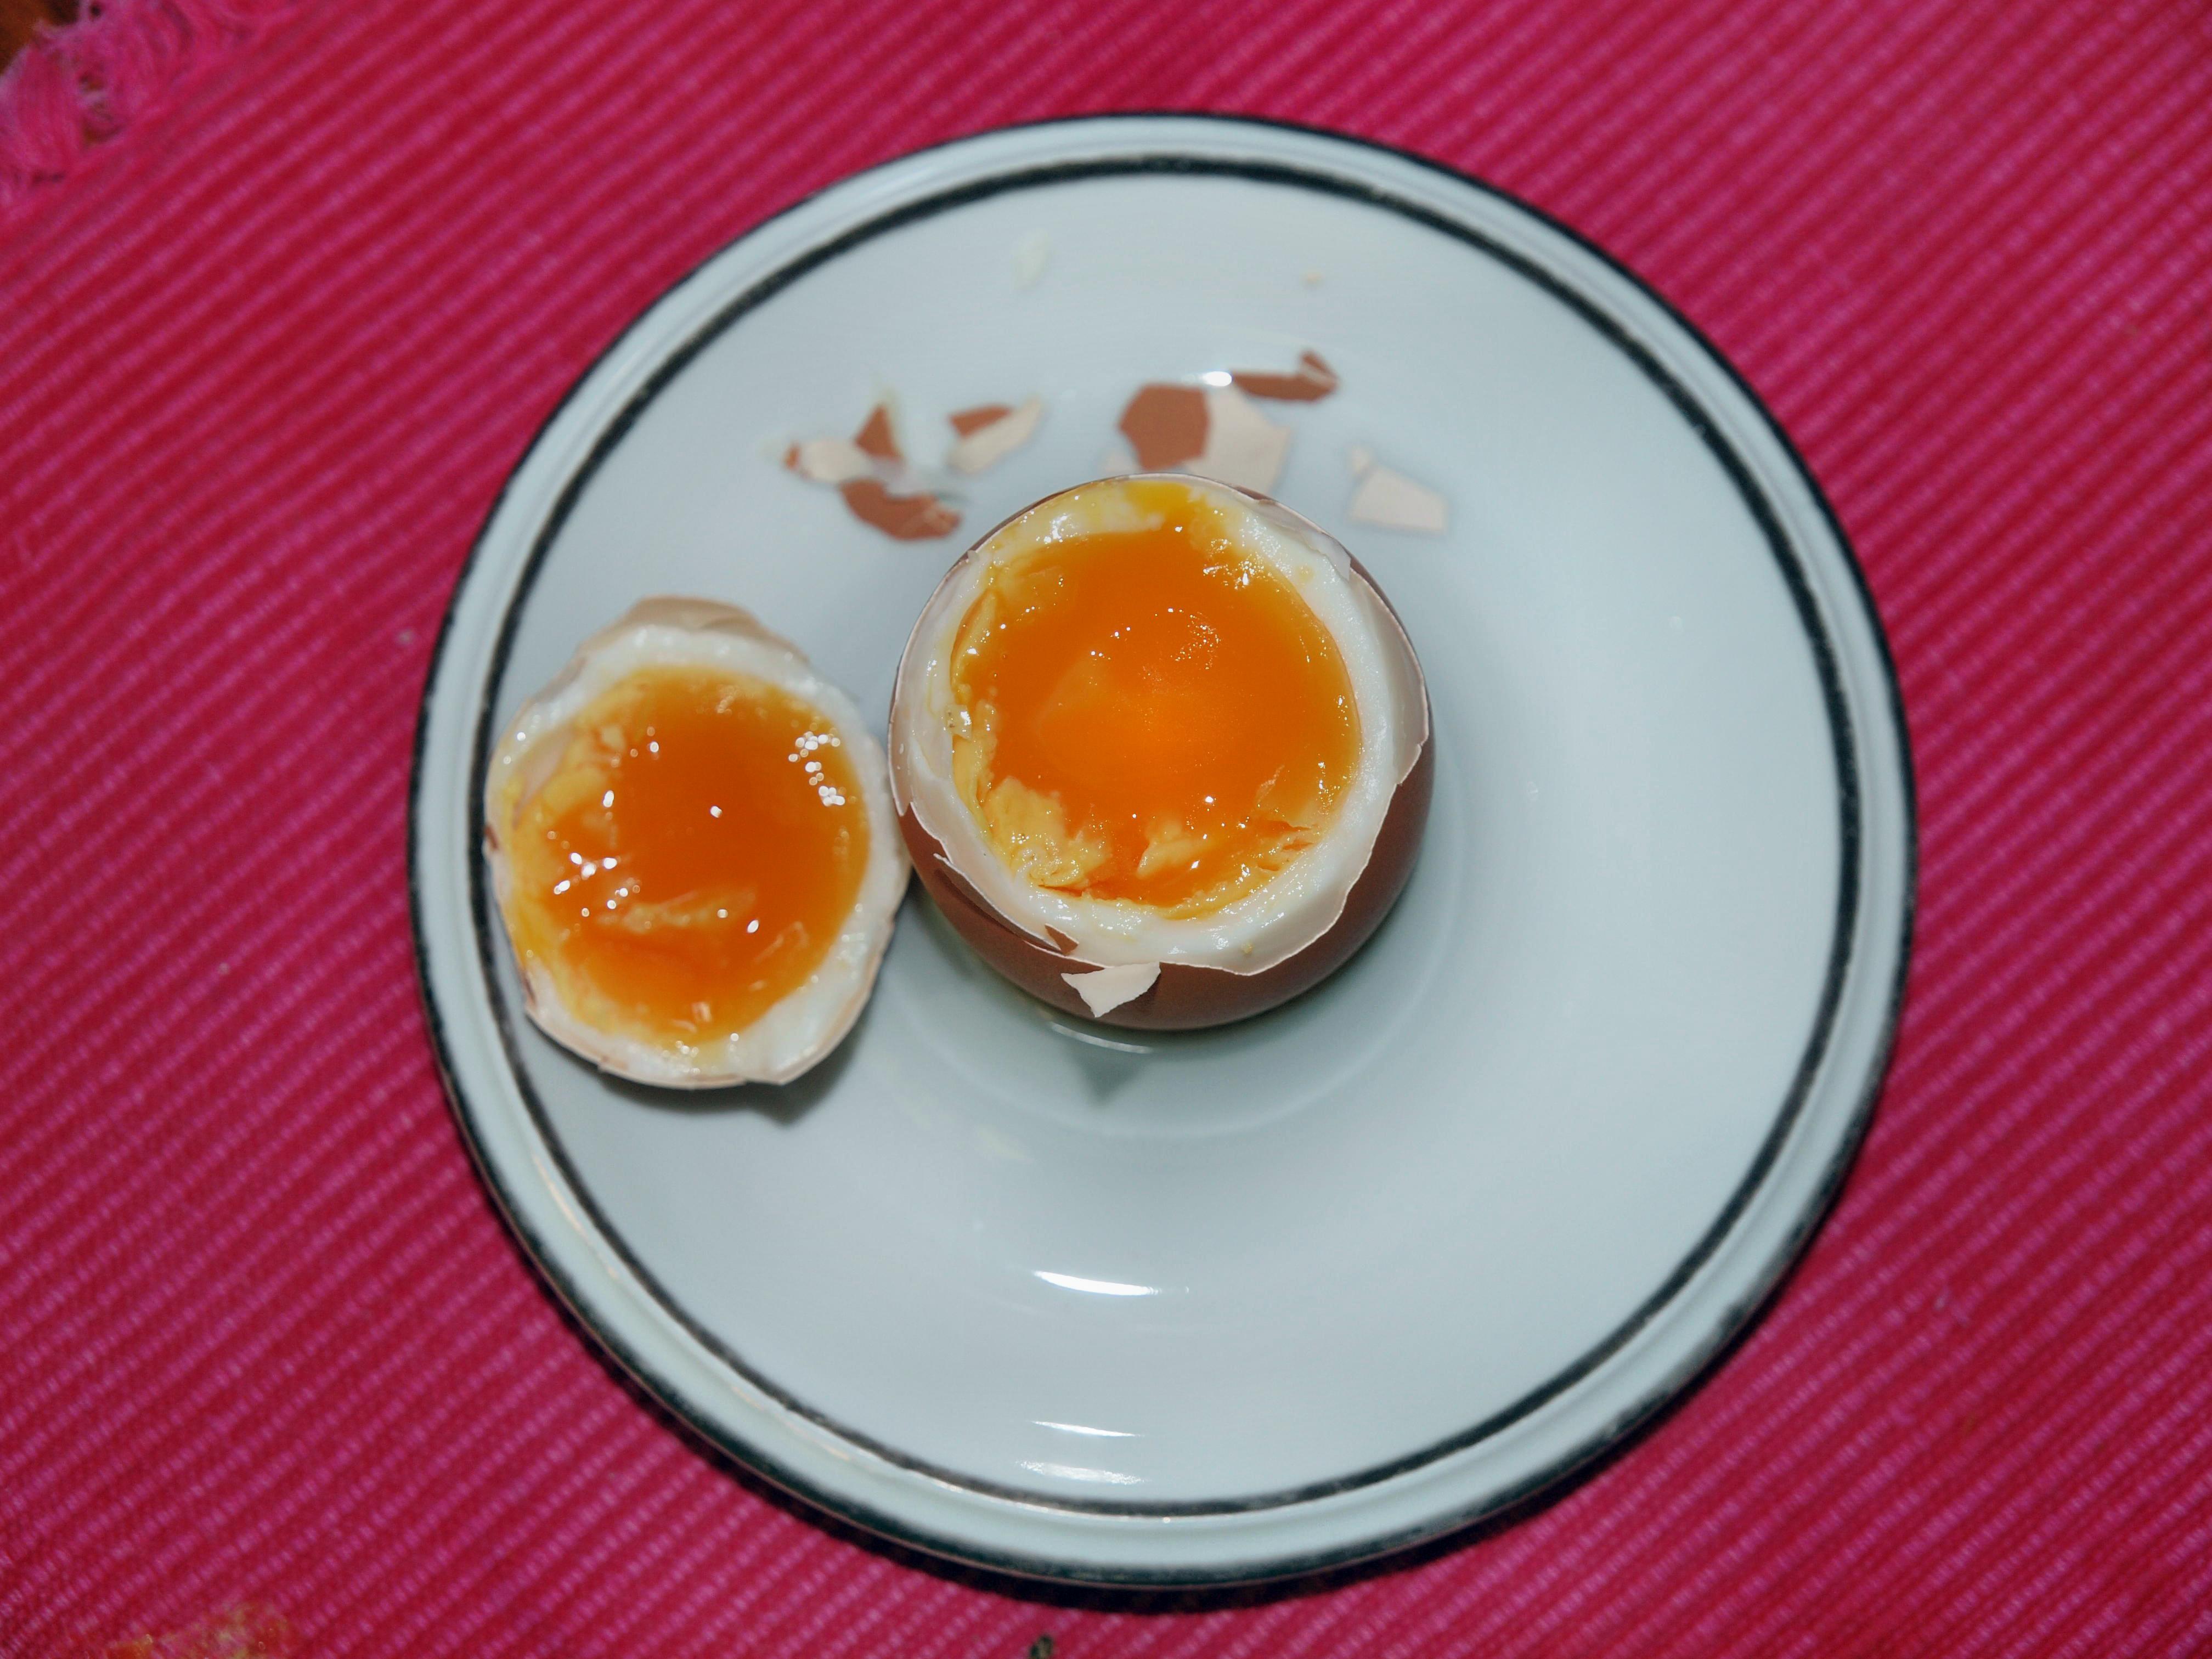 Eccentric-egg-1.jpeg